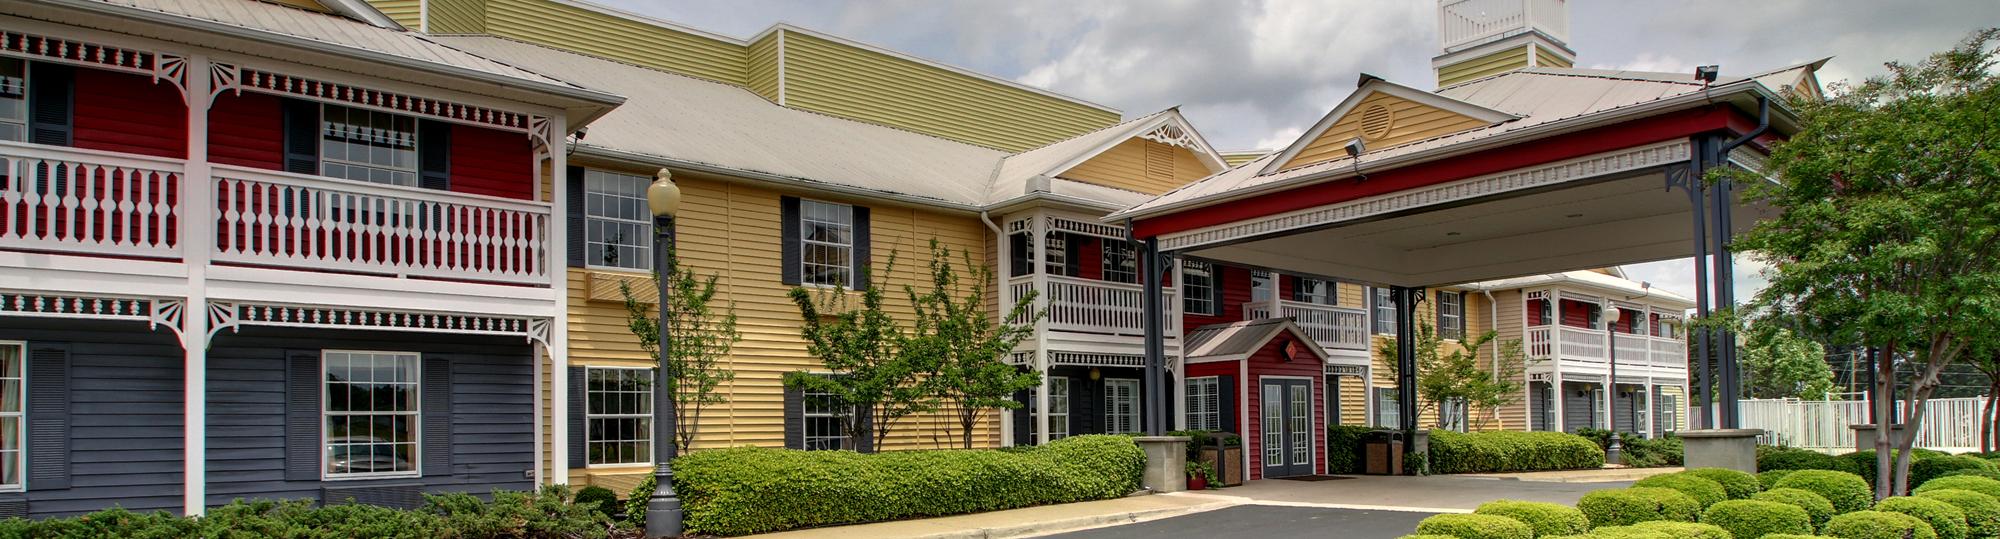 Centerstone Hotel Tuscaloosa